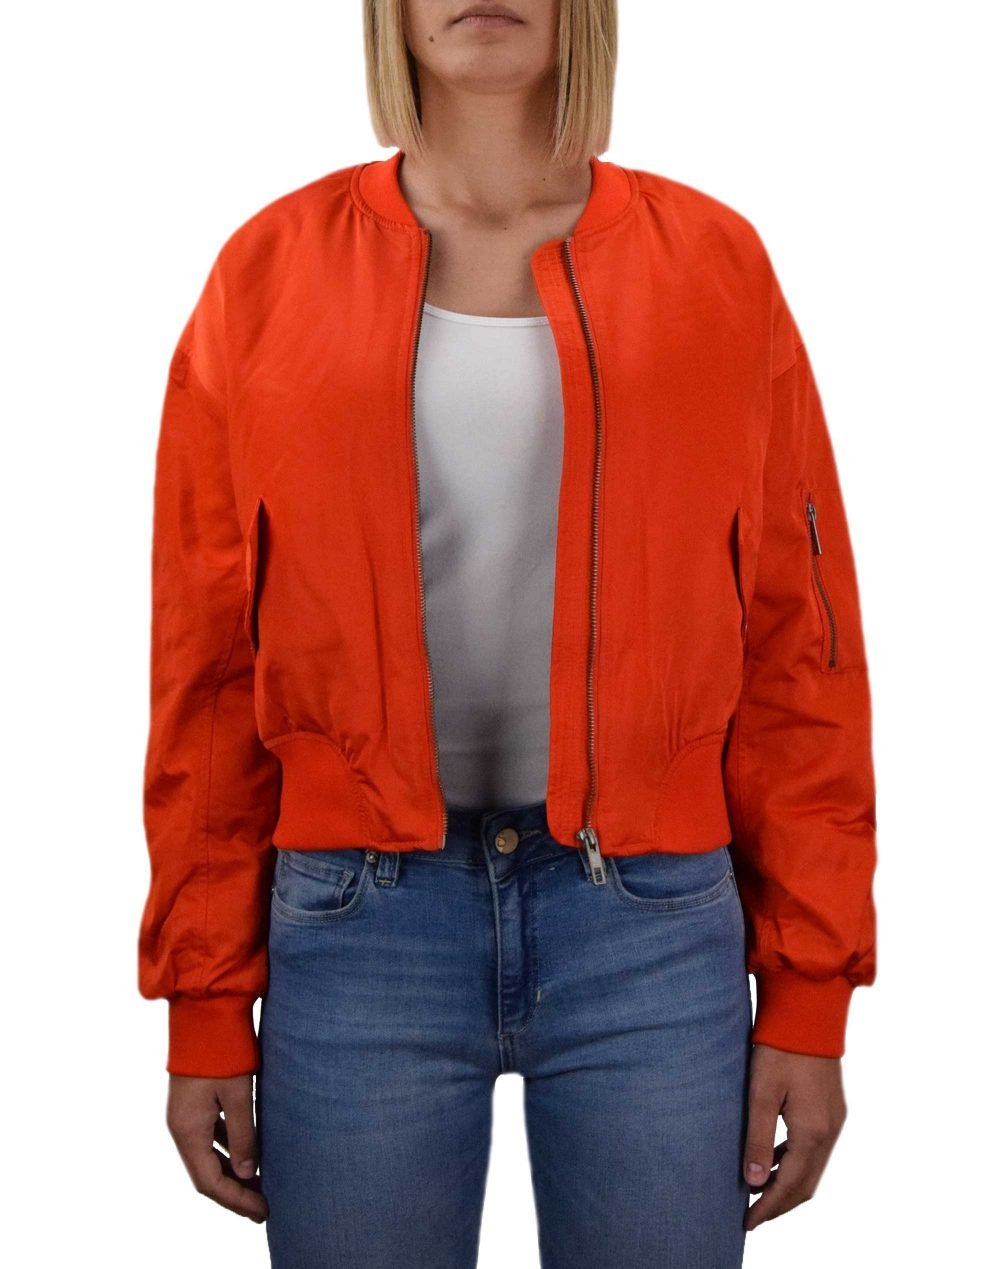 Only Patty Spring Bomber Jacket (15219756) Orange Com